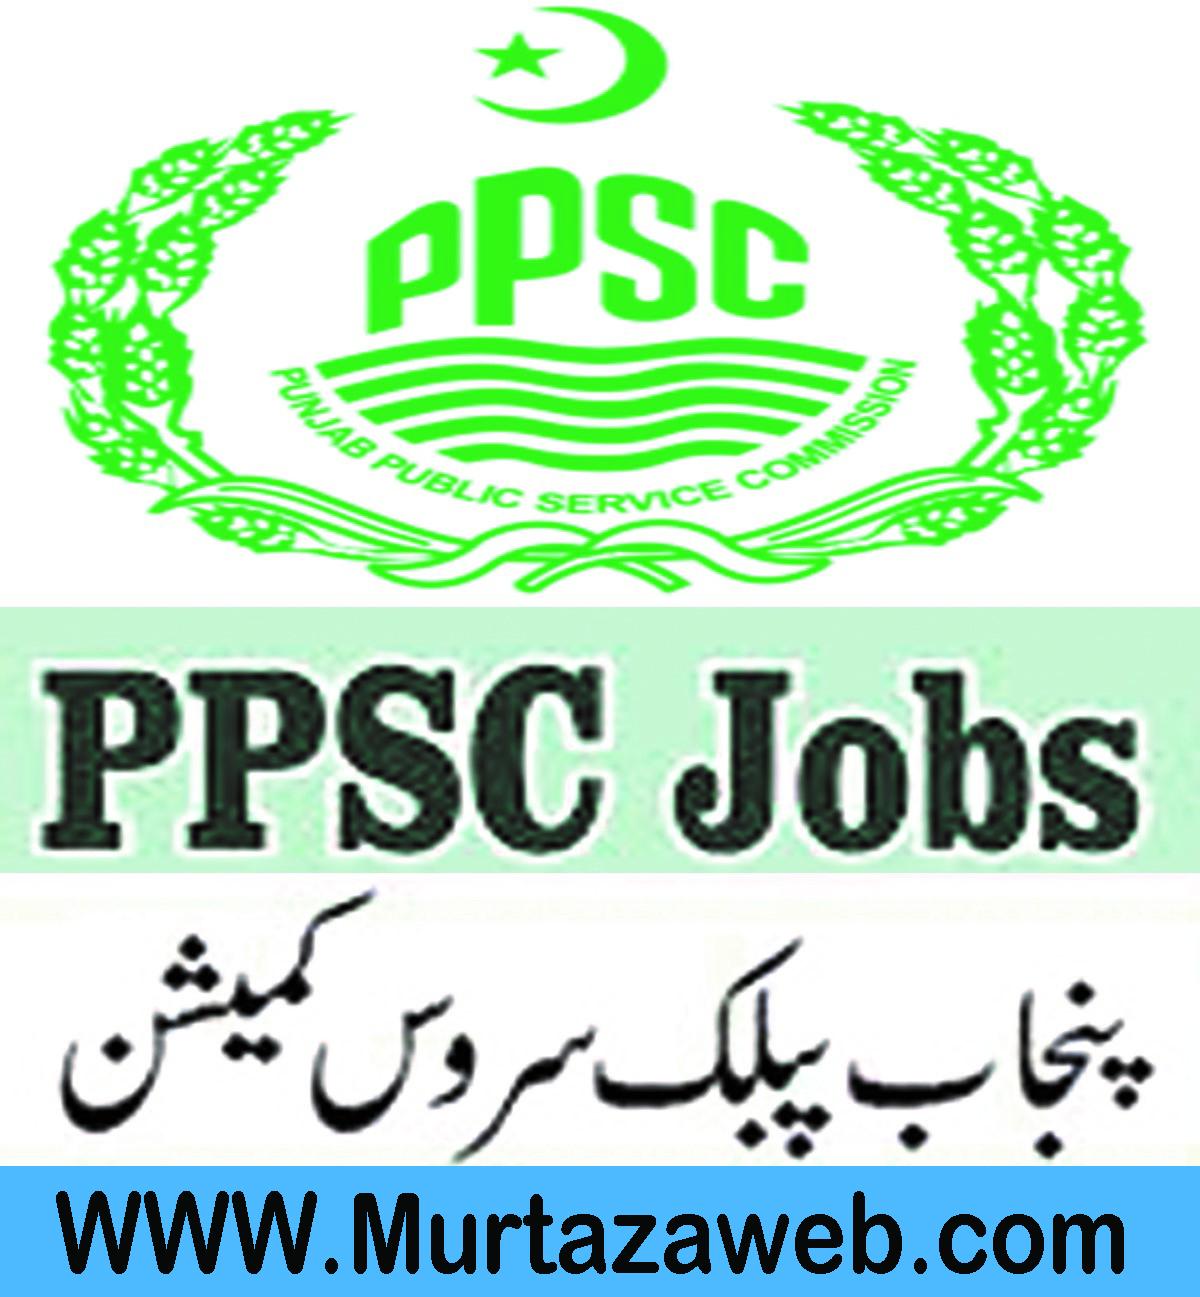 PPSC Jobs 2021 Advertisement No. 20-2021 Online Apply